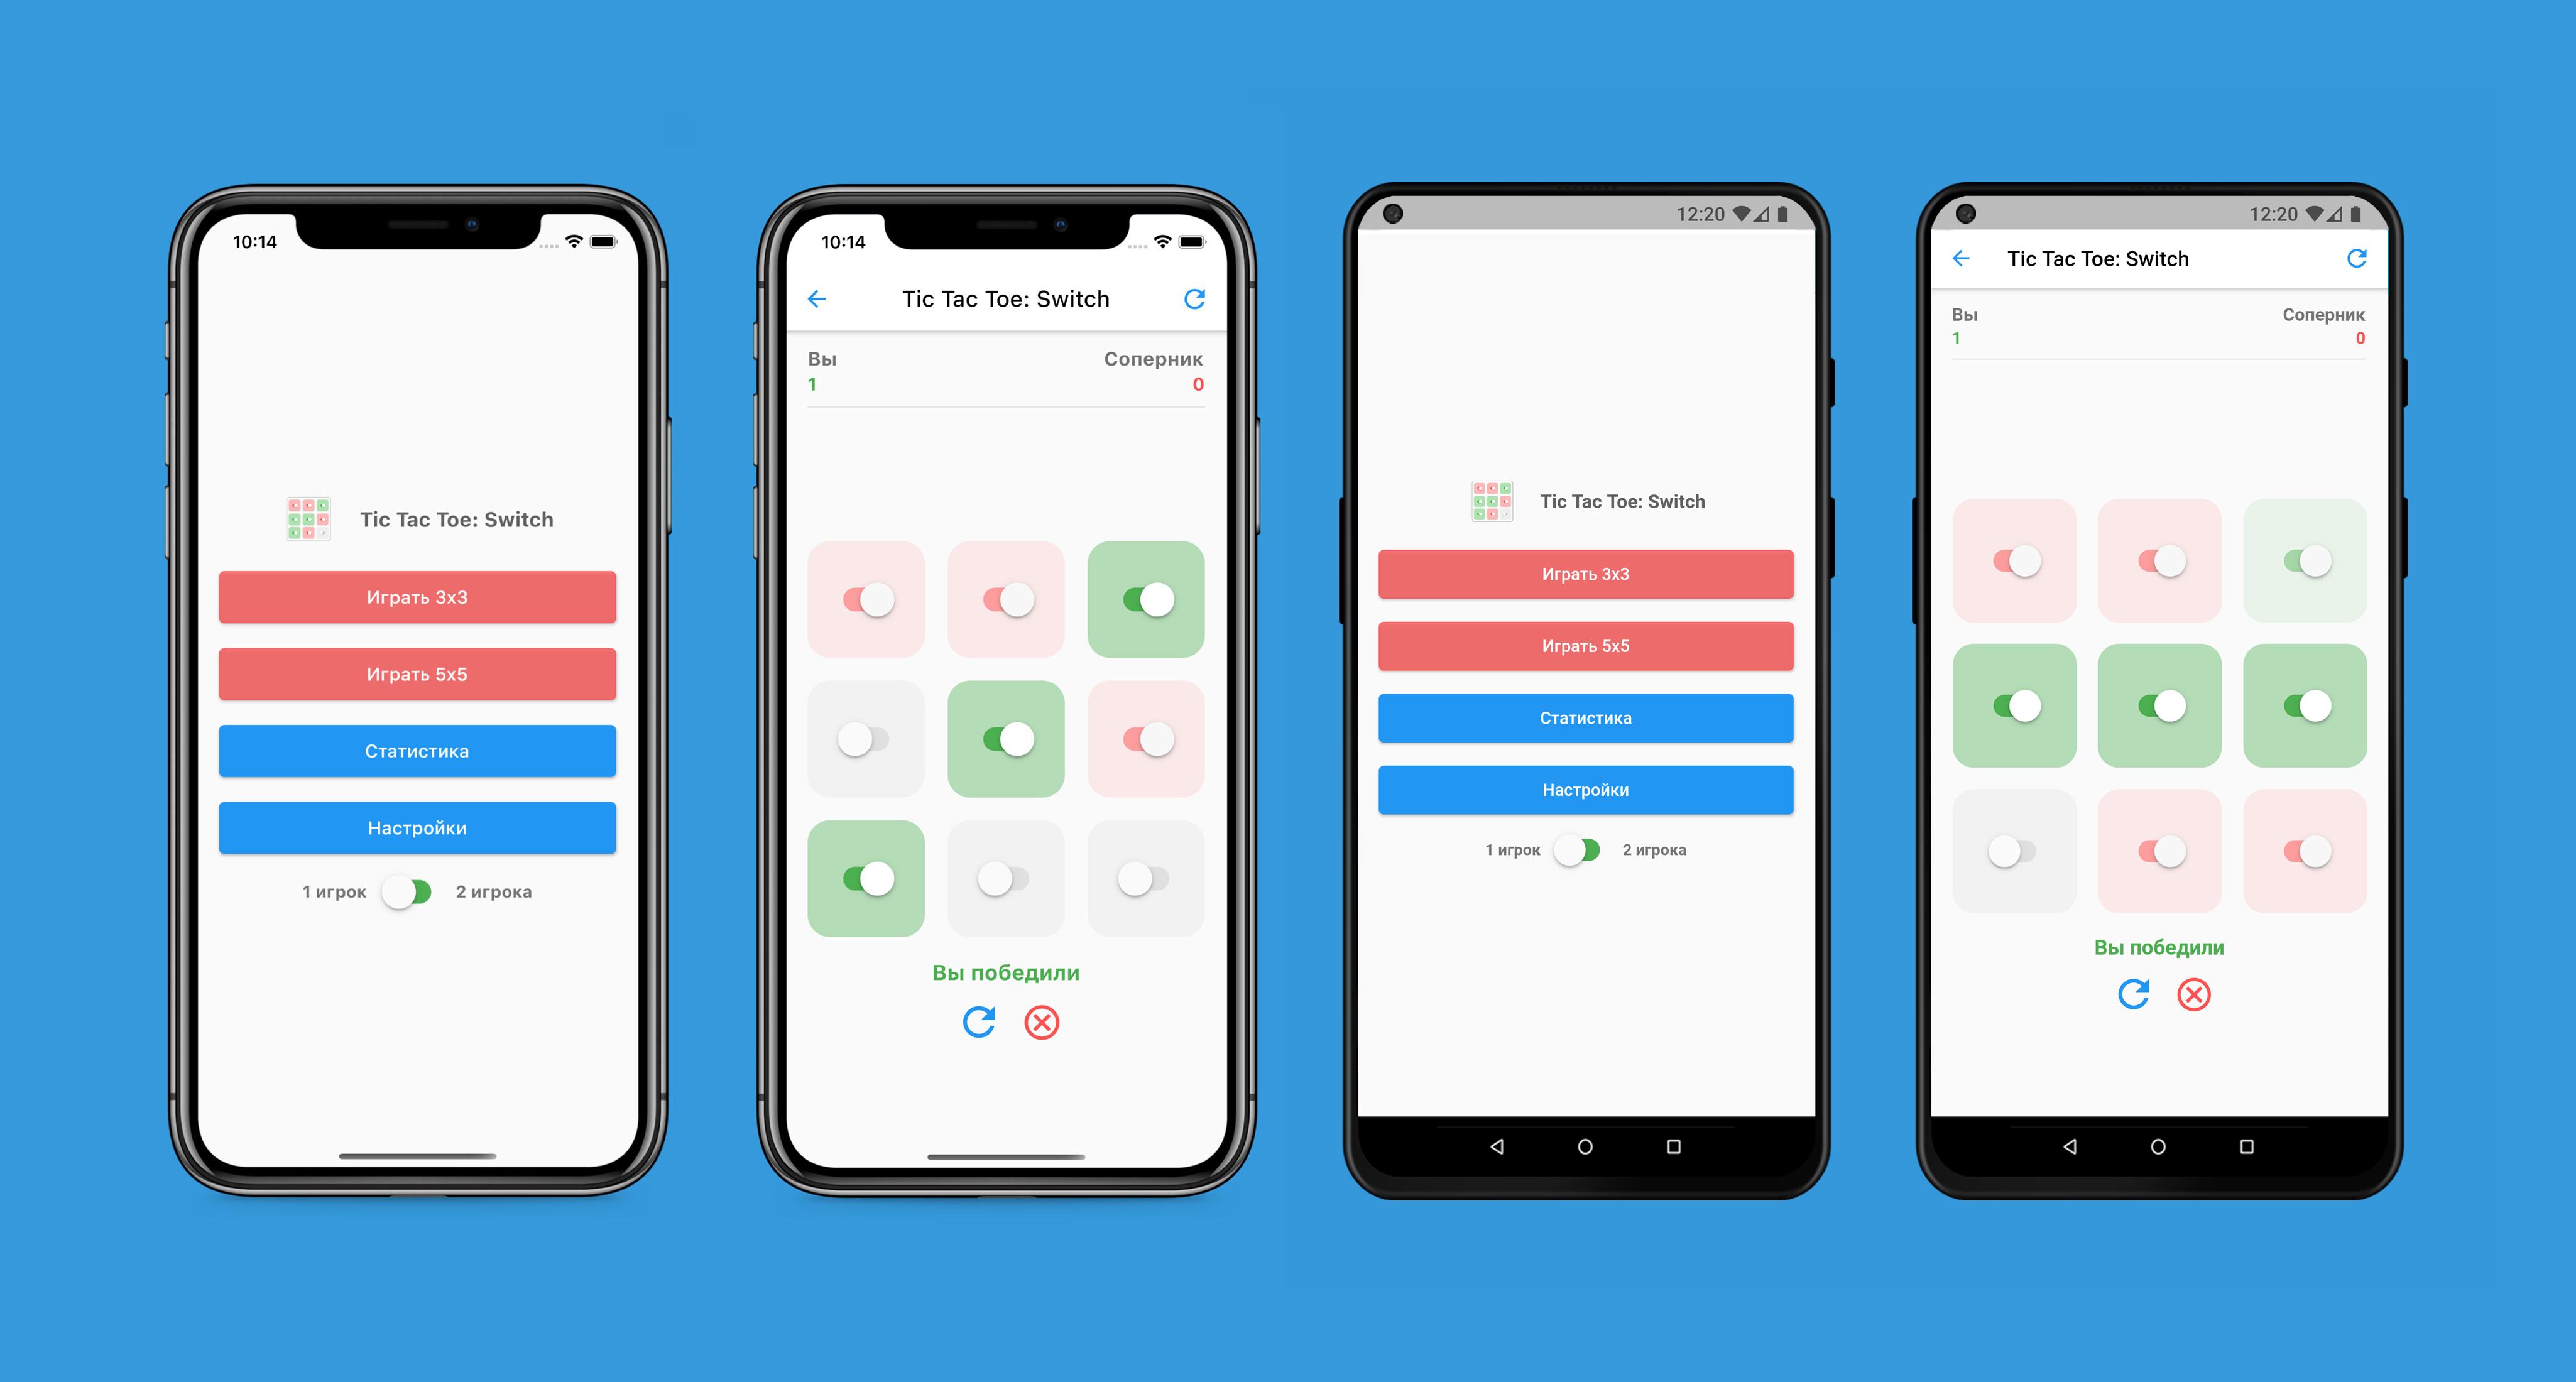 Игра Tic Tac Toe: Switch на Flutter (iOS / Android)